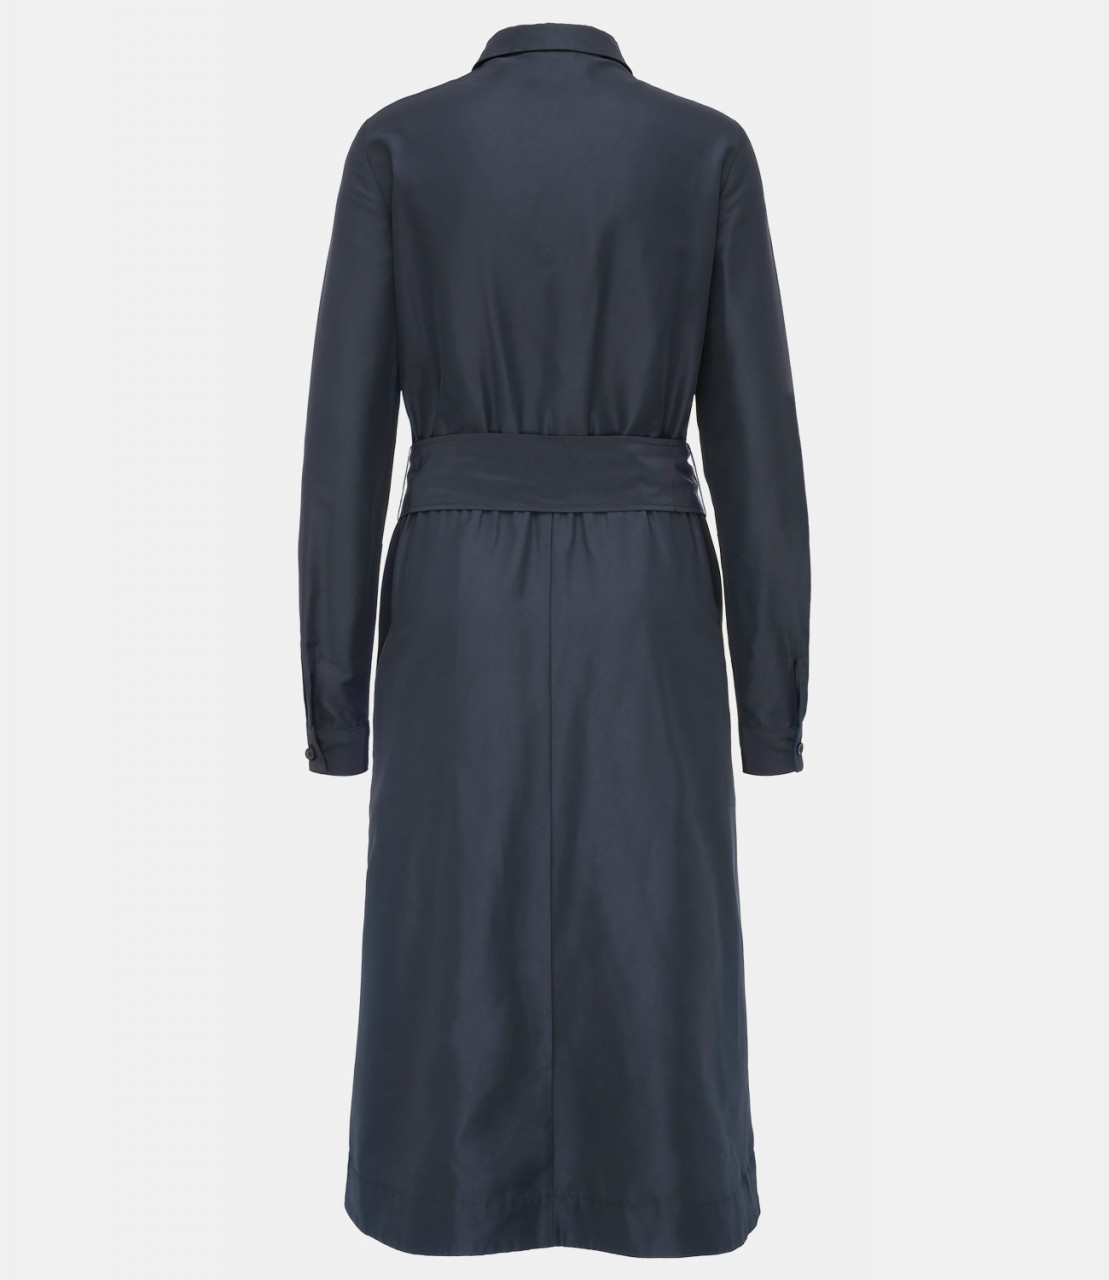 Trenchcoat-Kleid